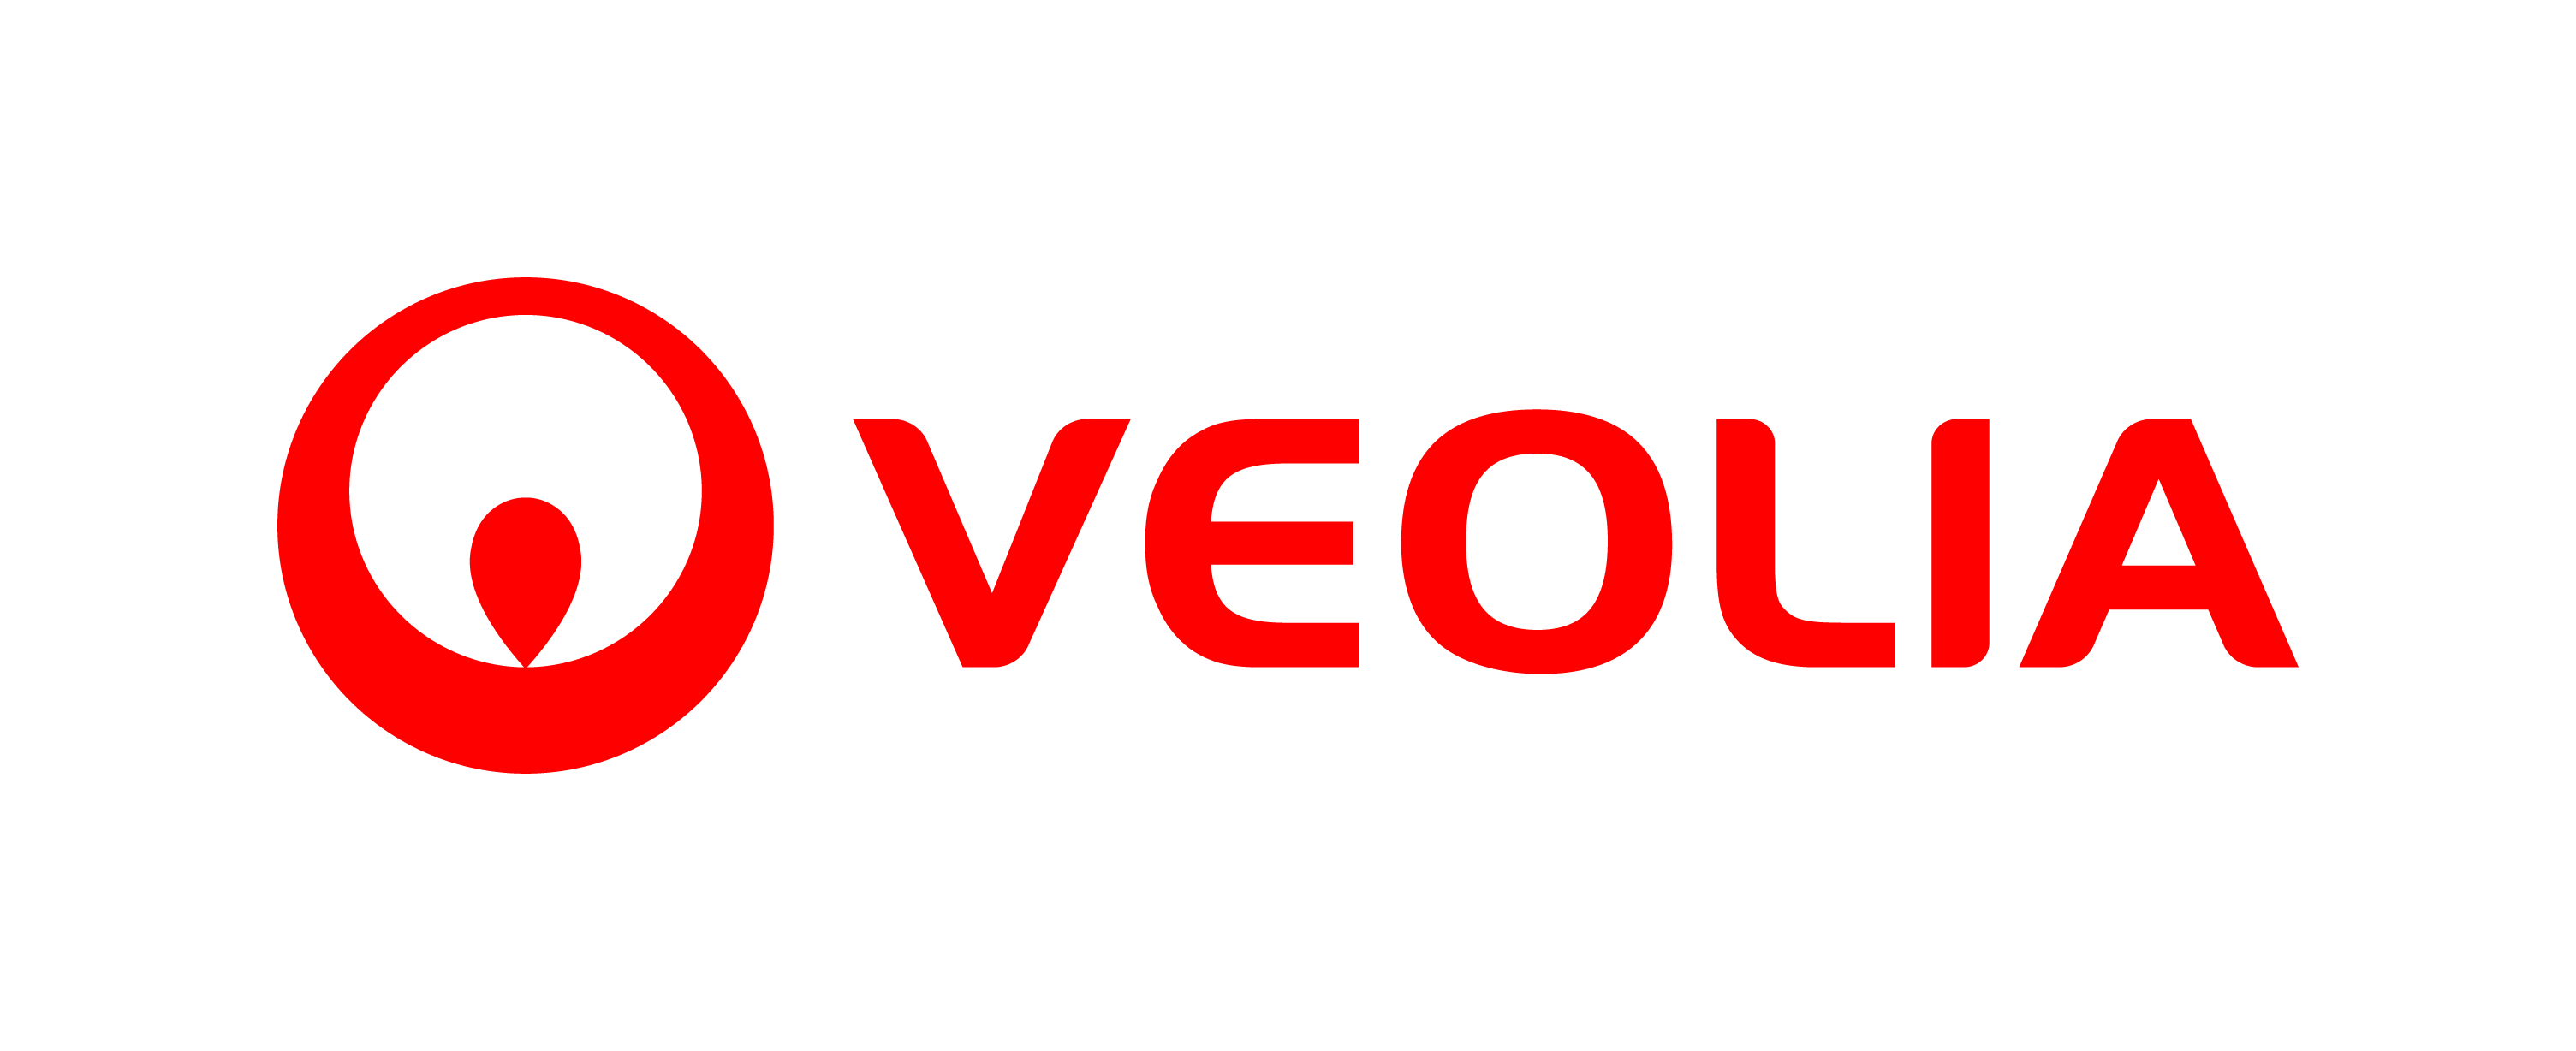 Centrum prasowe Veolia logo